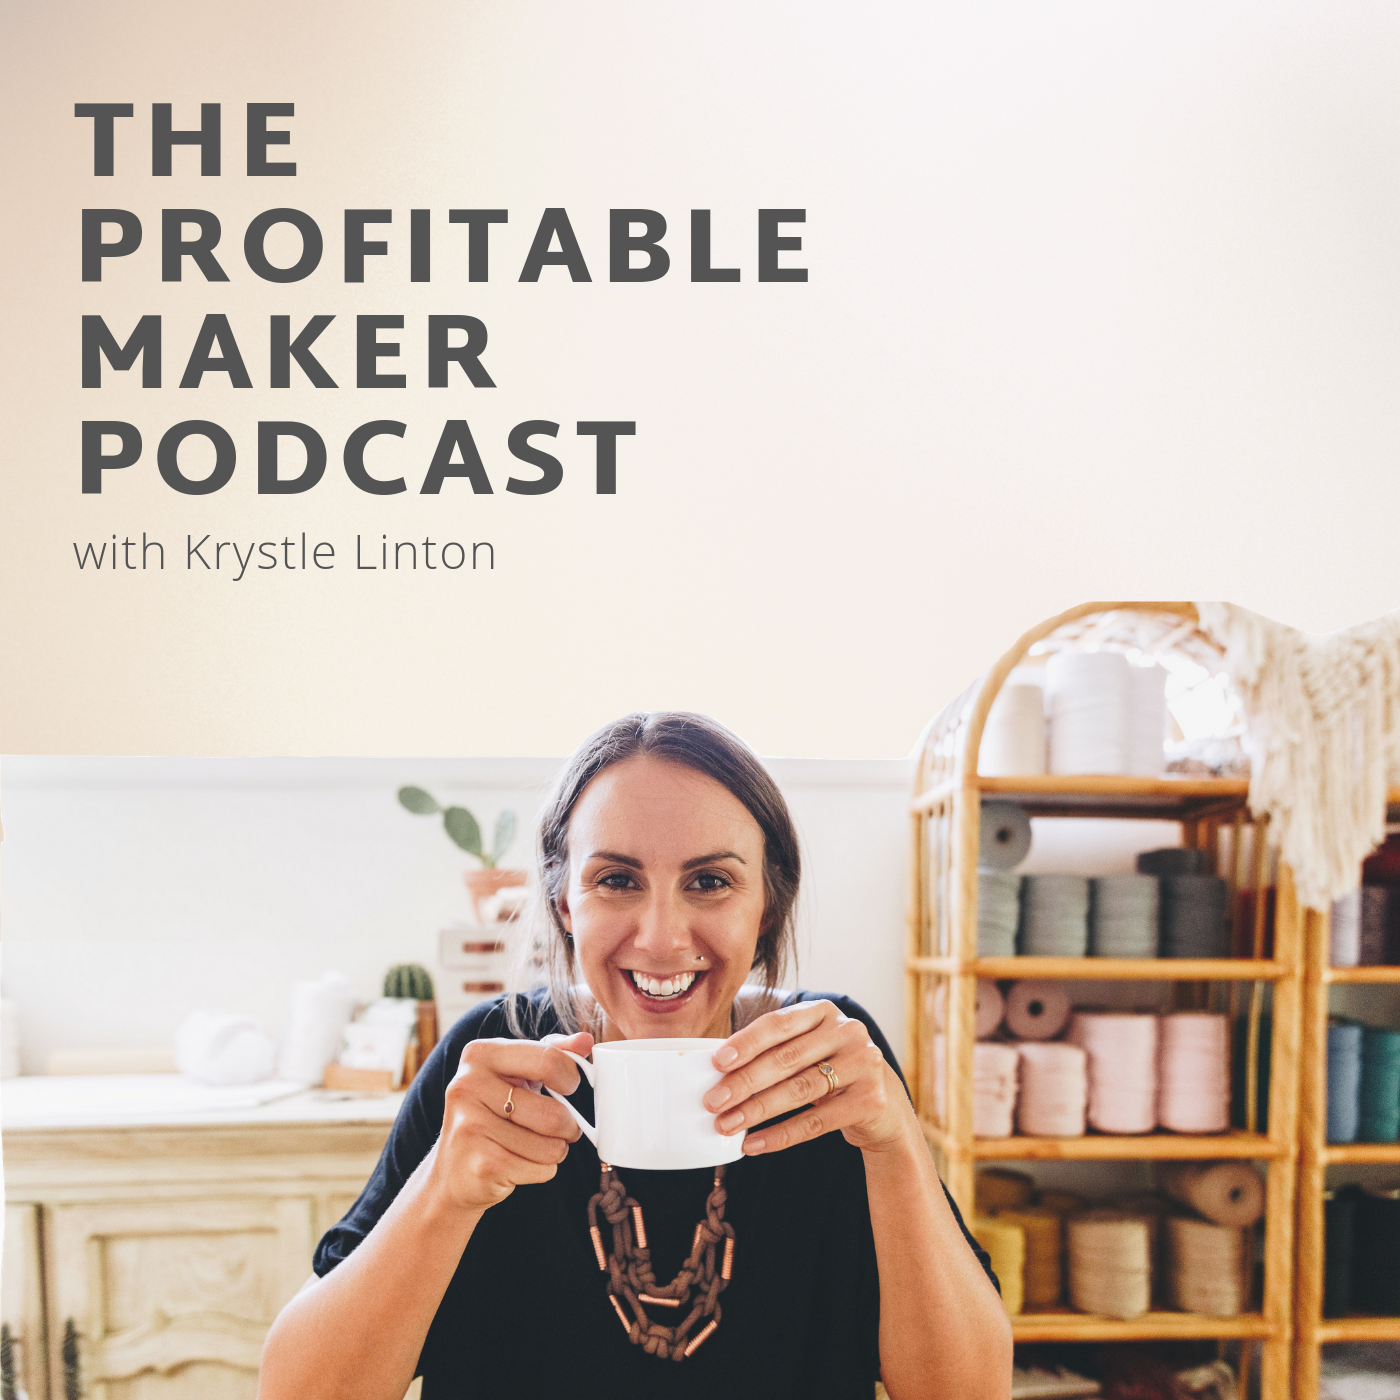 The Profitable Maker Podcast show art